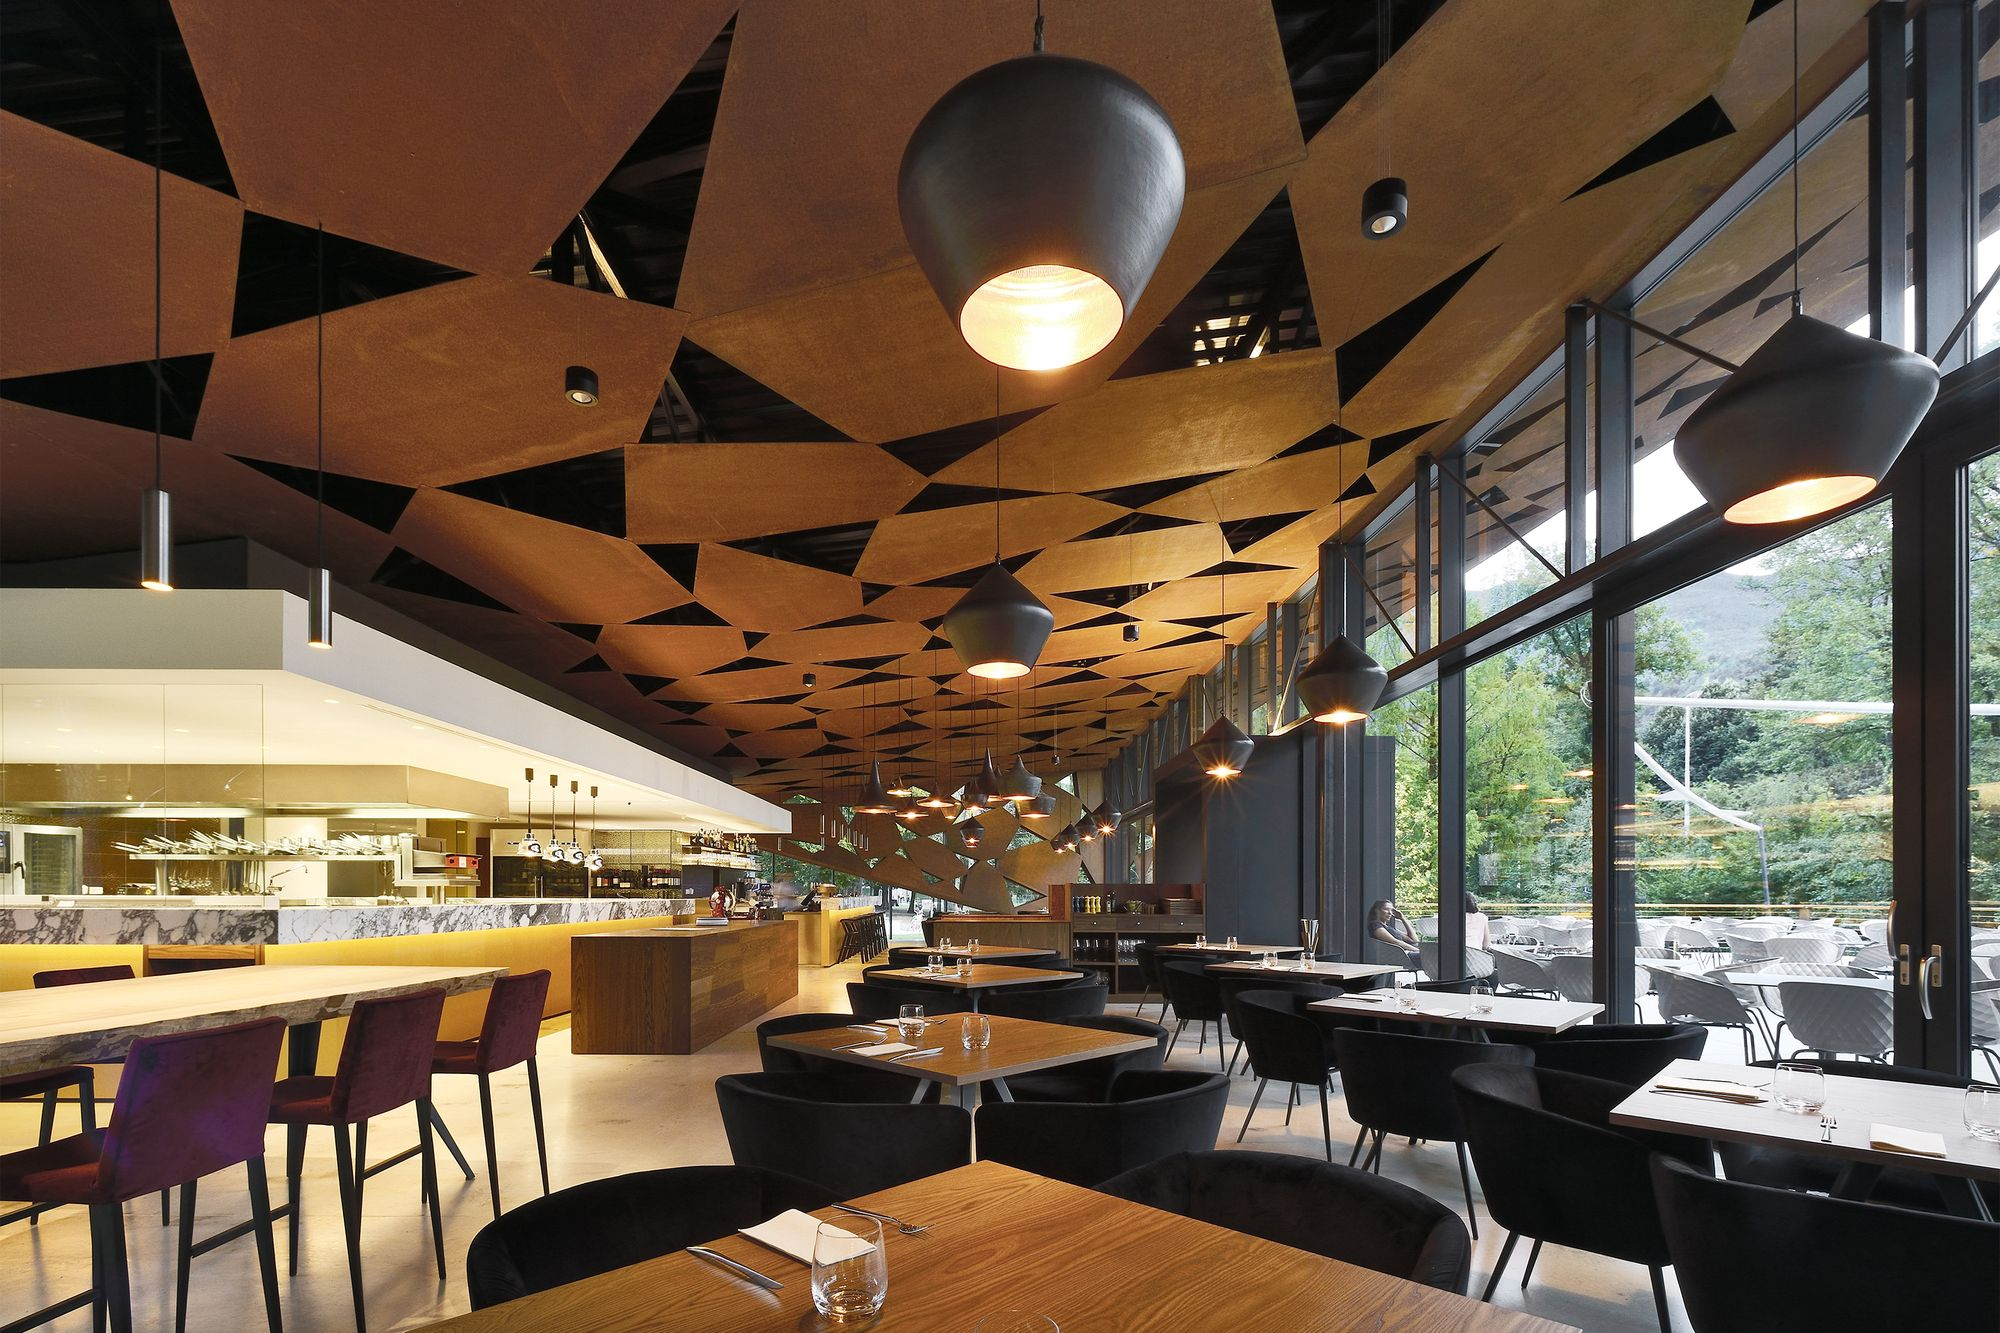 Gallery of Restaurant Brix 01 Markus